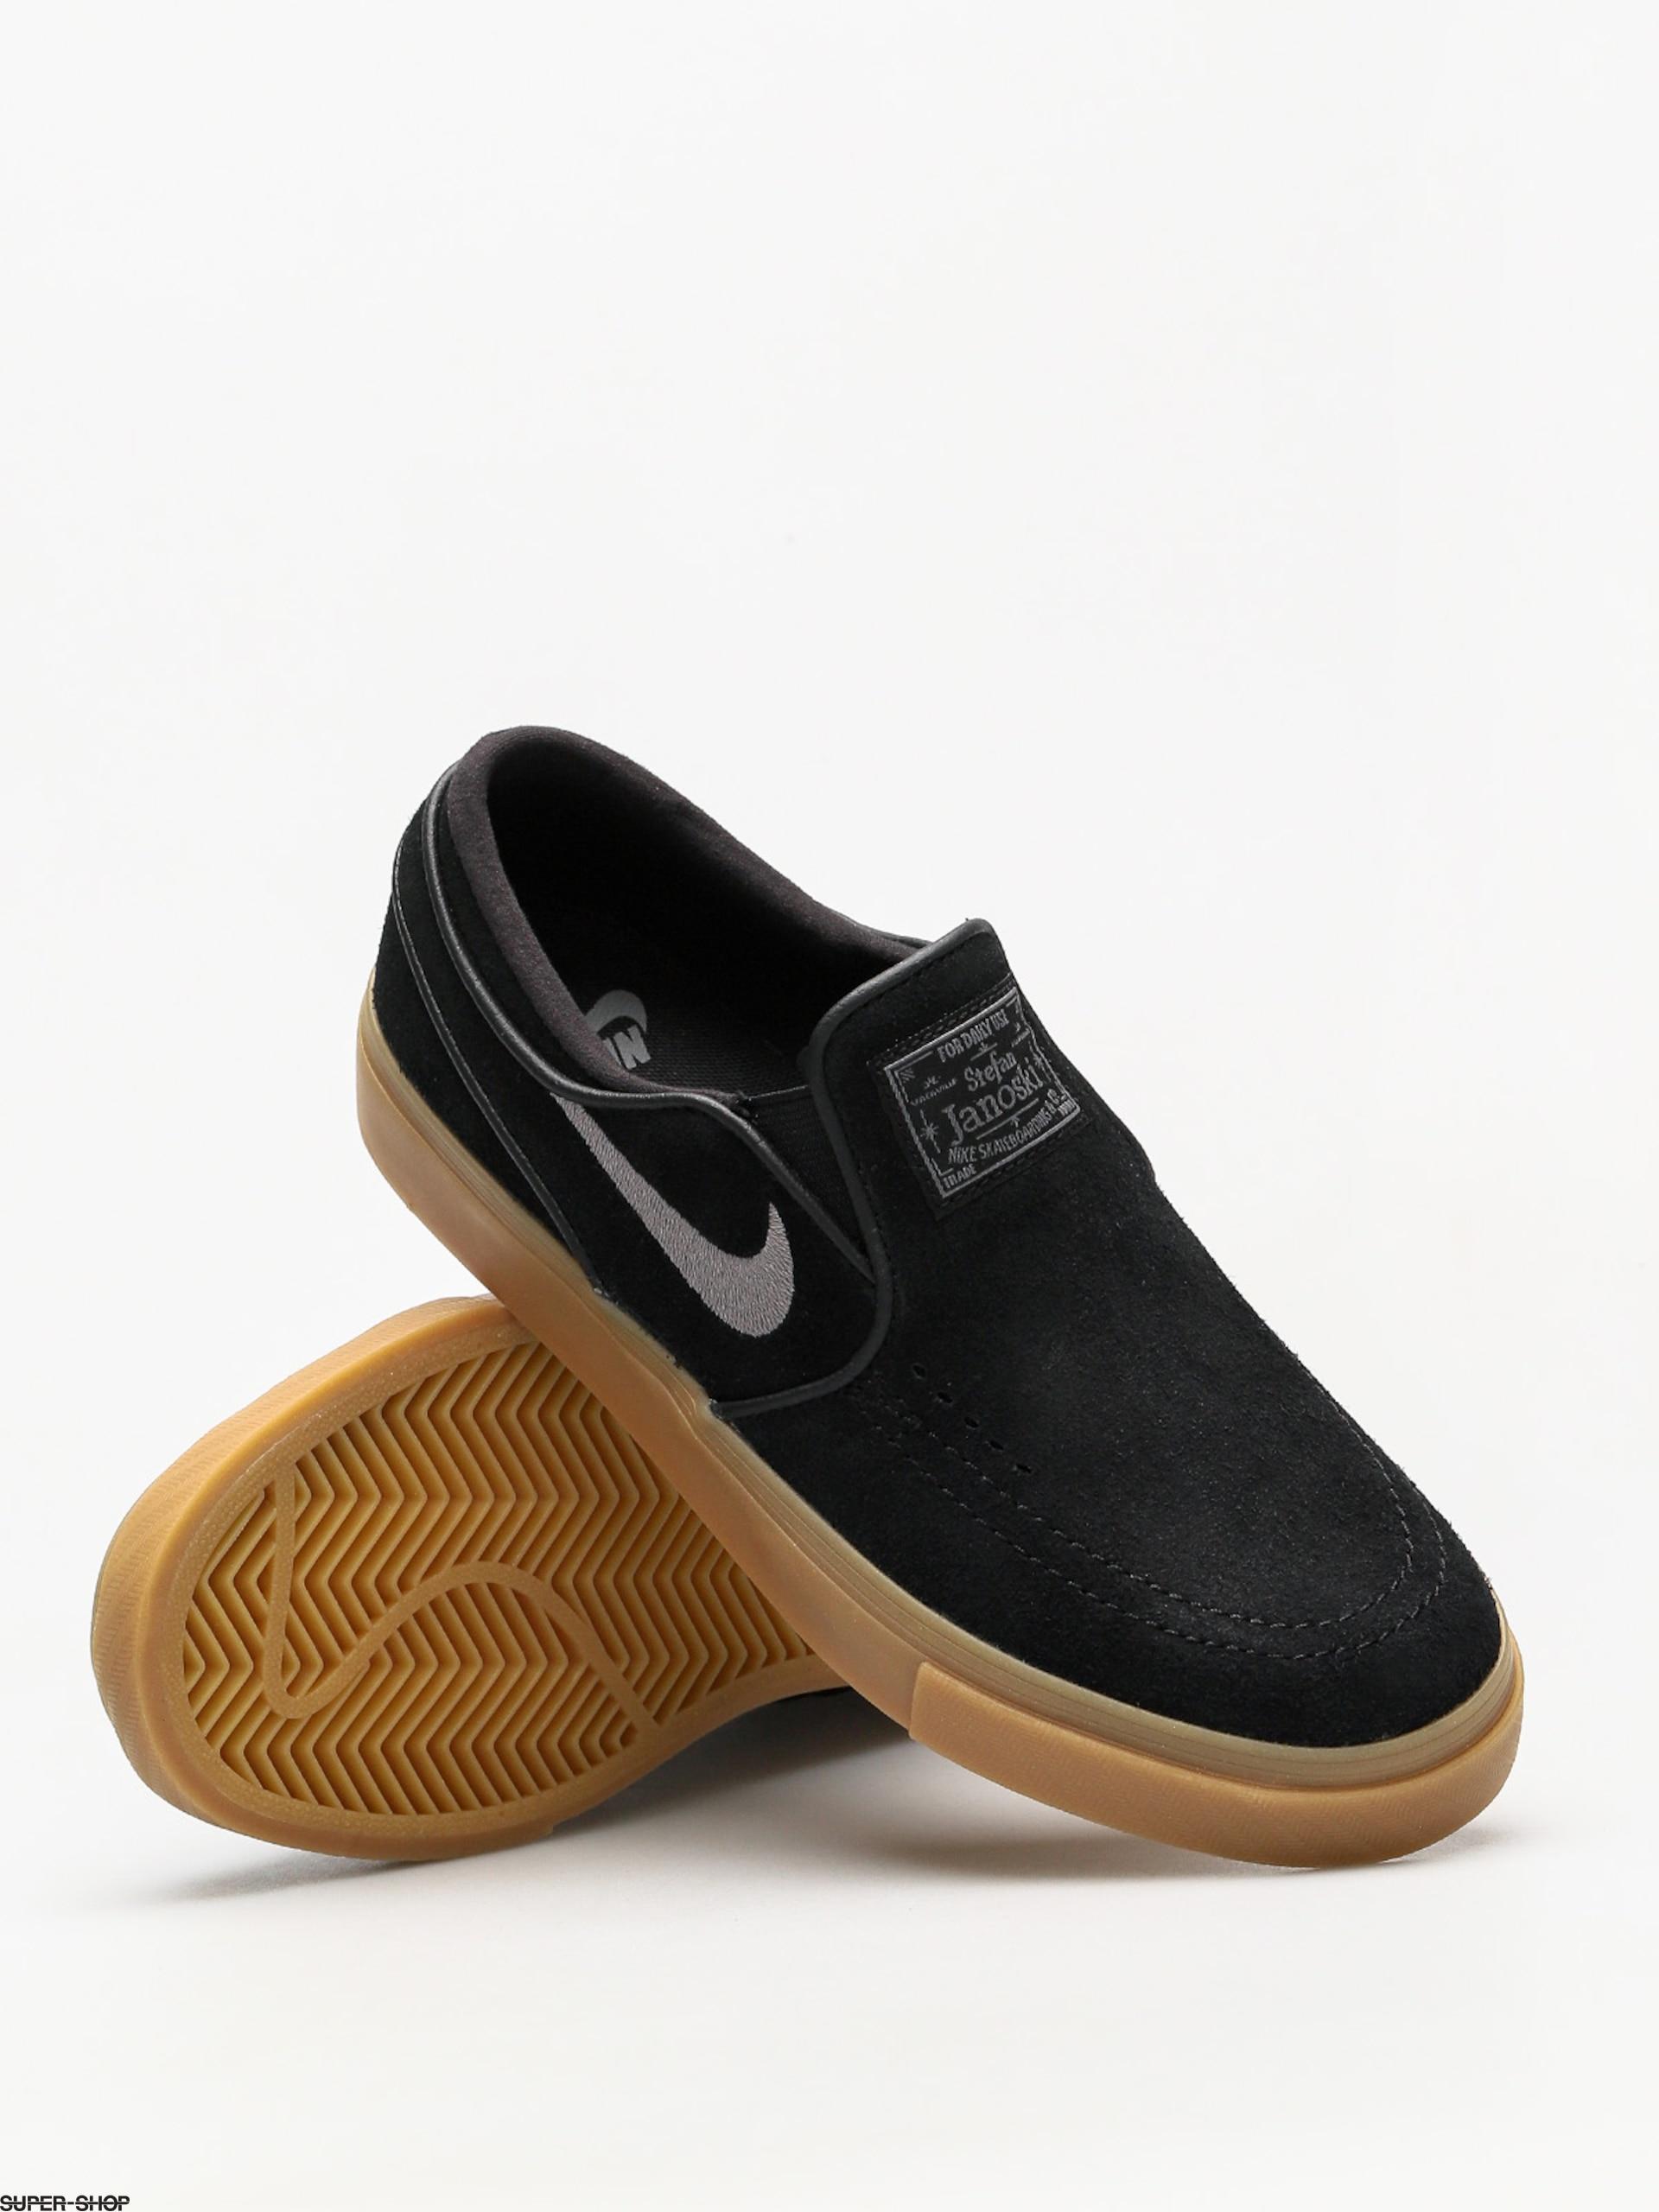 Nike SB Schuhe Air Zoom Stefan Janoski Slip (schwarz/gunsmoke gum